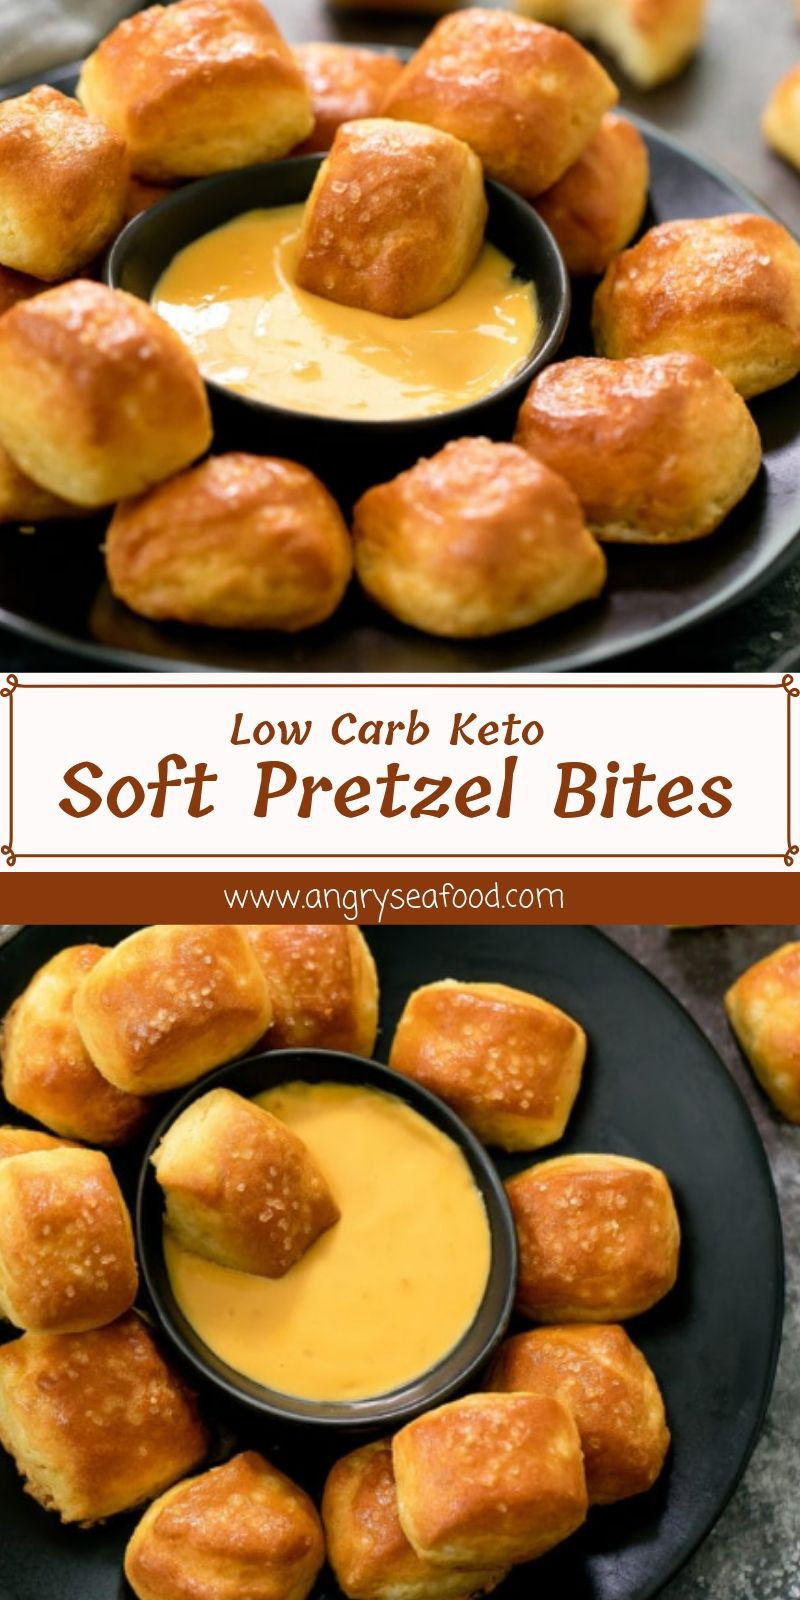 Low Carb Keto Soft Pretzel Bites  Low Carb Keto Soft Pretzel Bites Healthyfoodrecipe